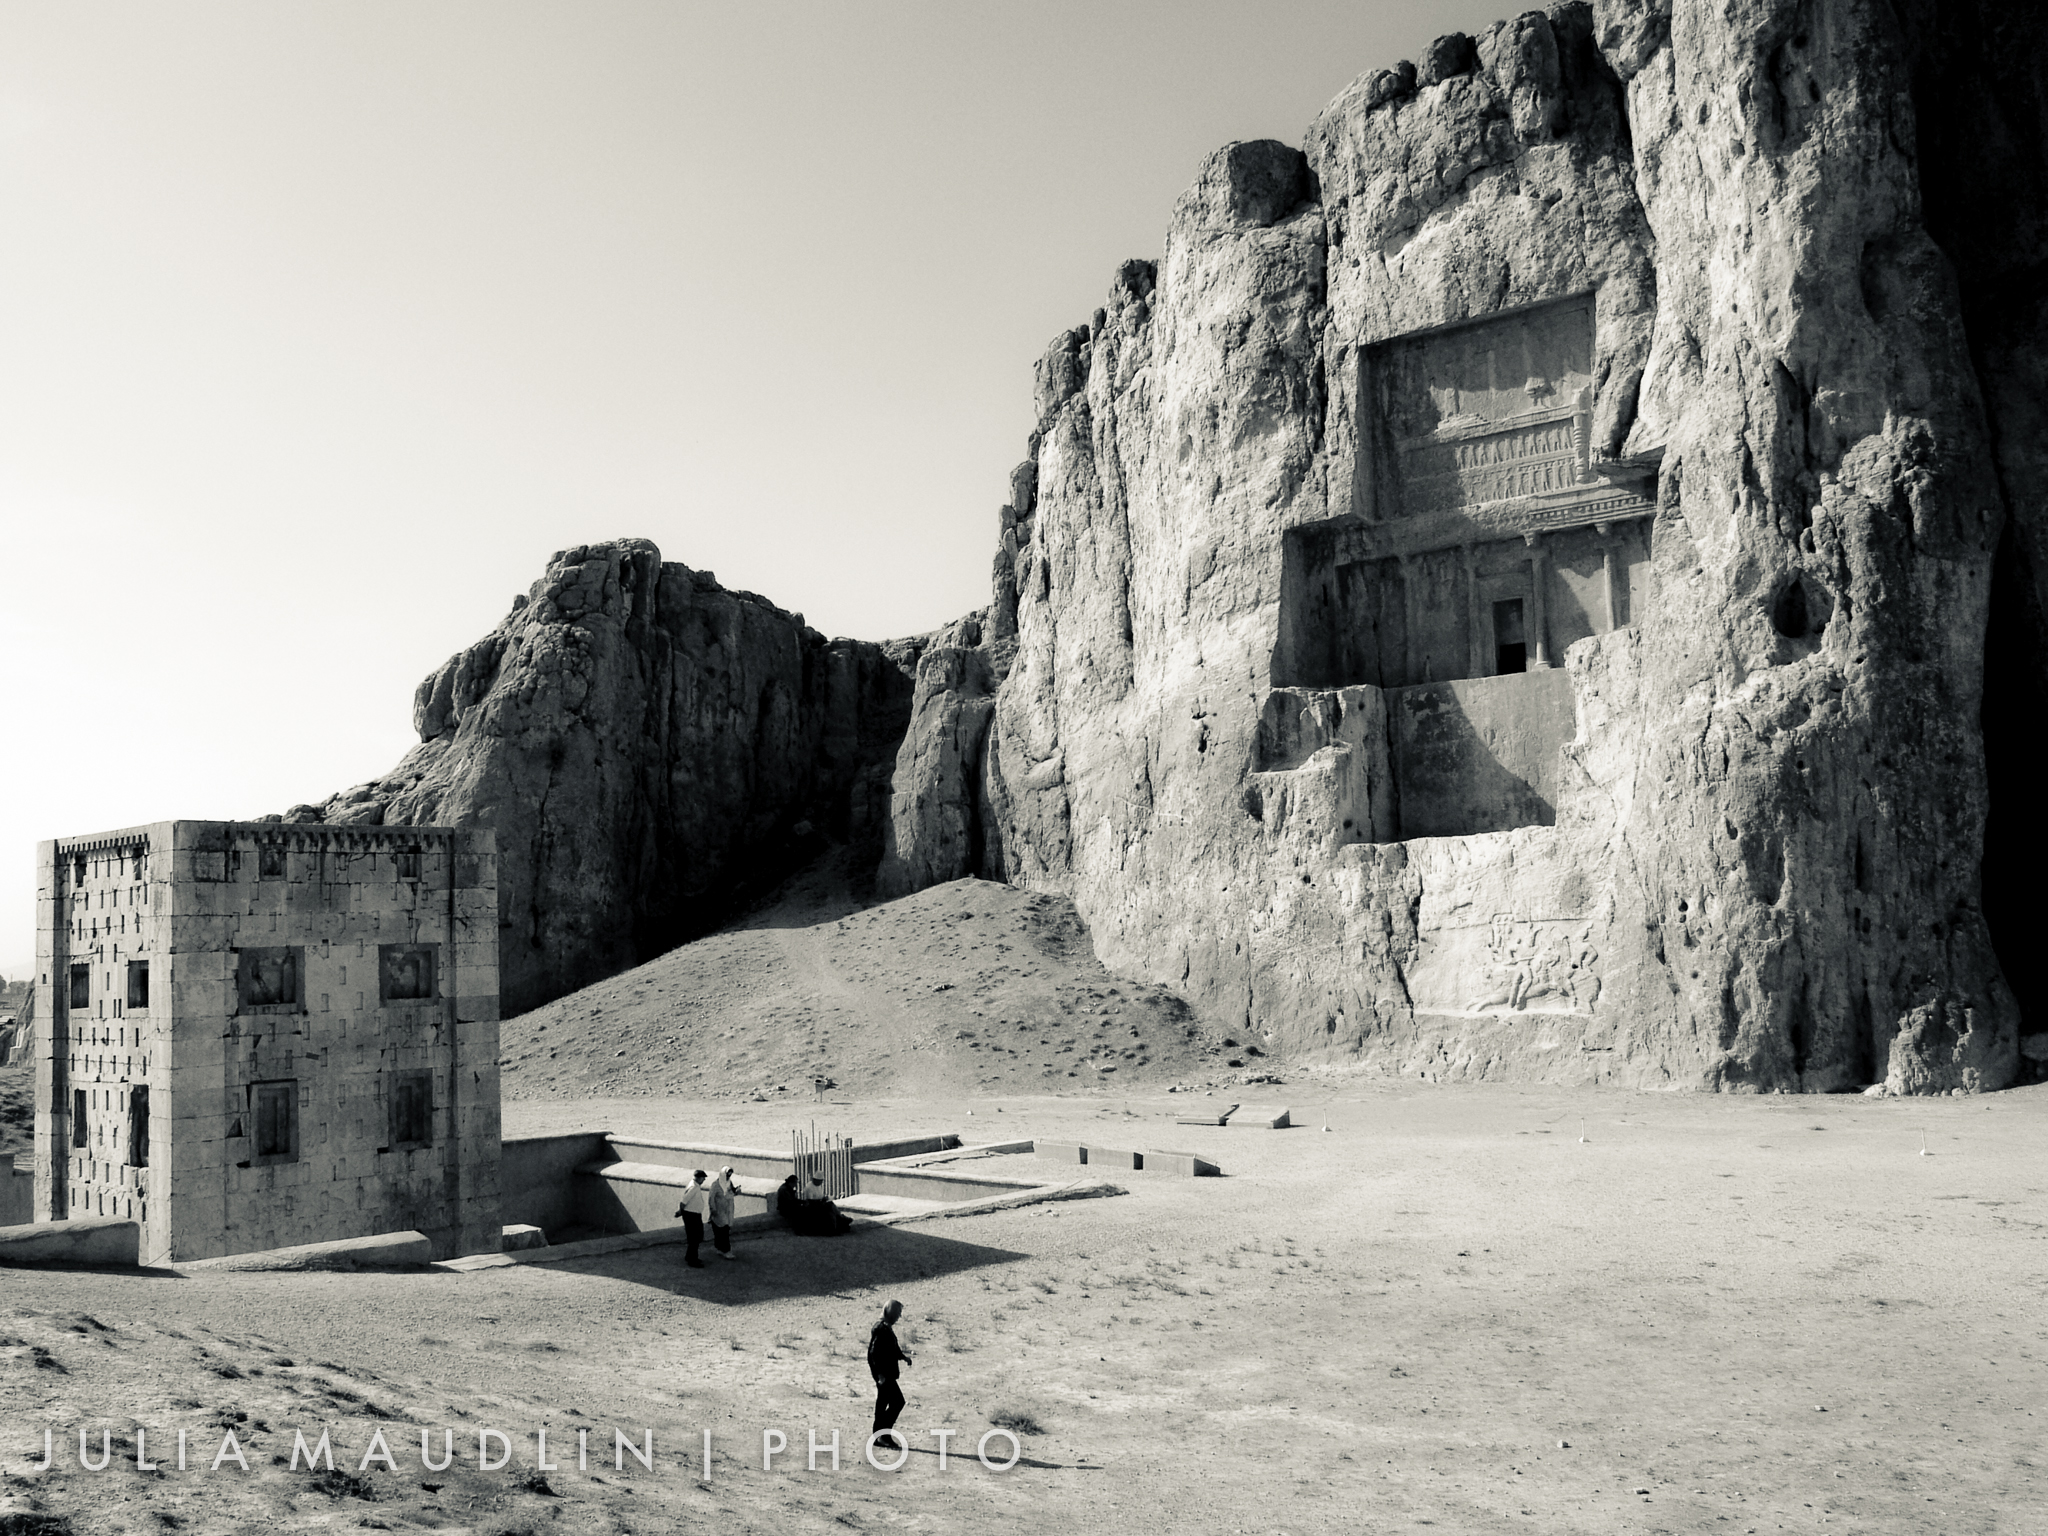 Ba Stock Chart: Ka7ba-ye Zartosht and Achaemenid Tombs Naqsh-E Rostam Iran ,Chart